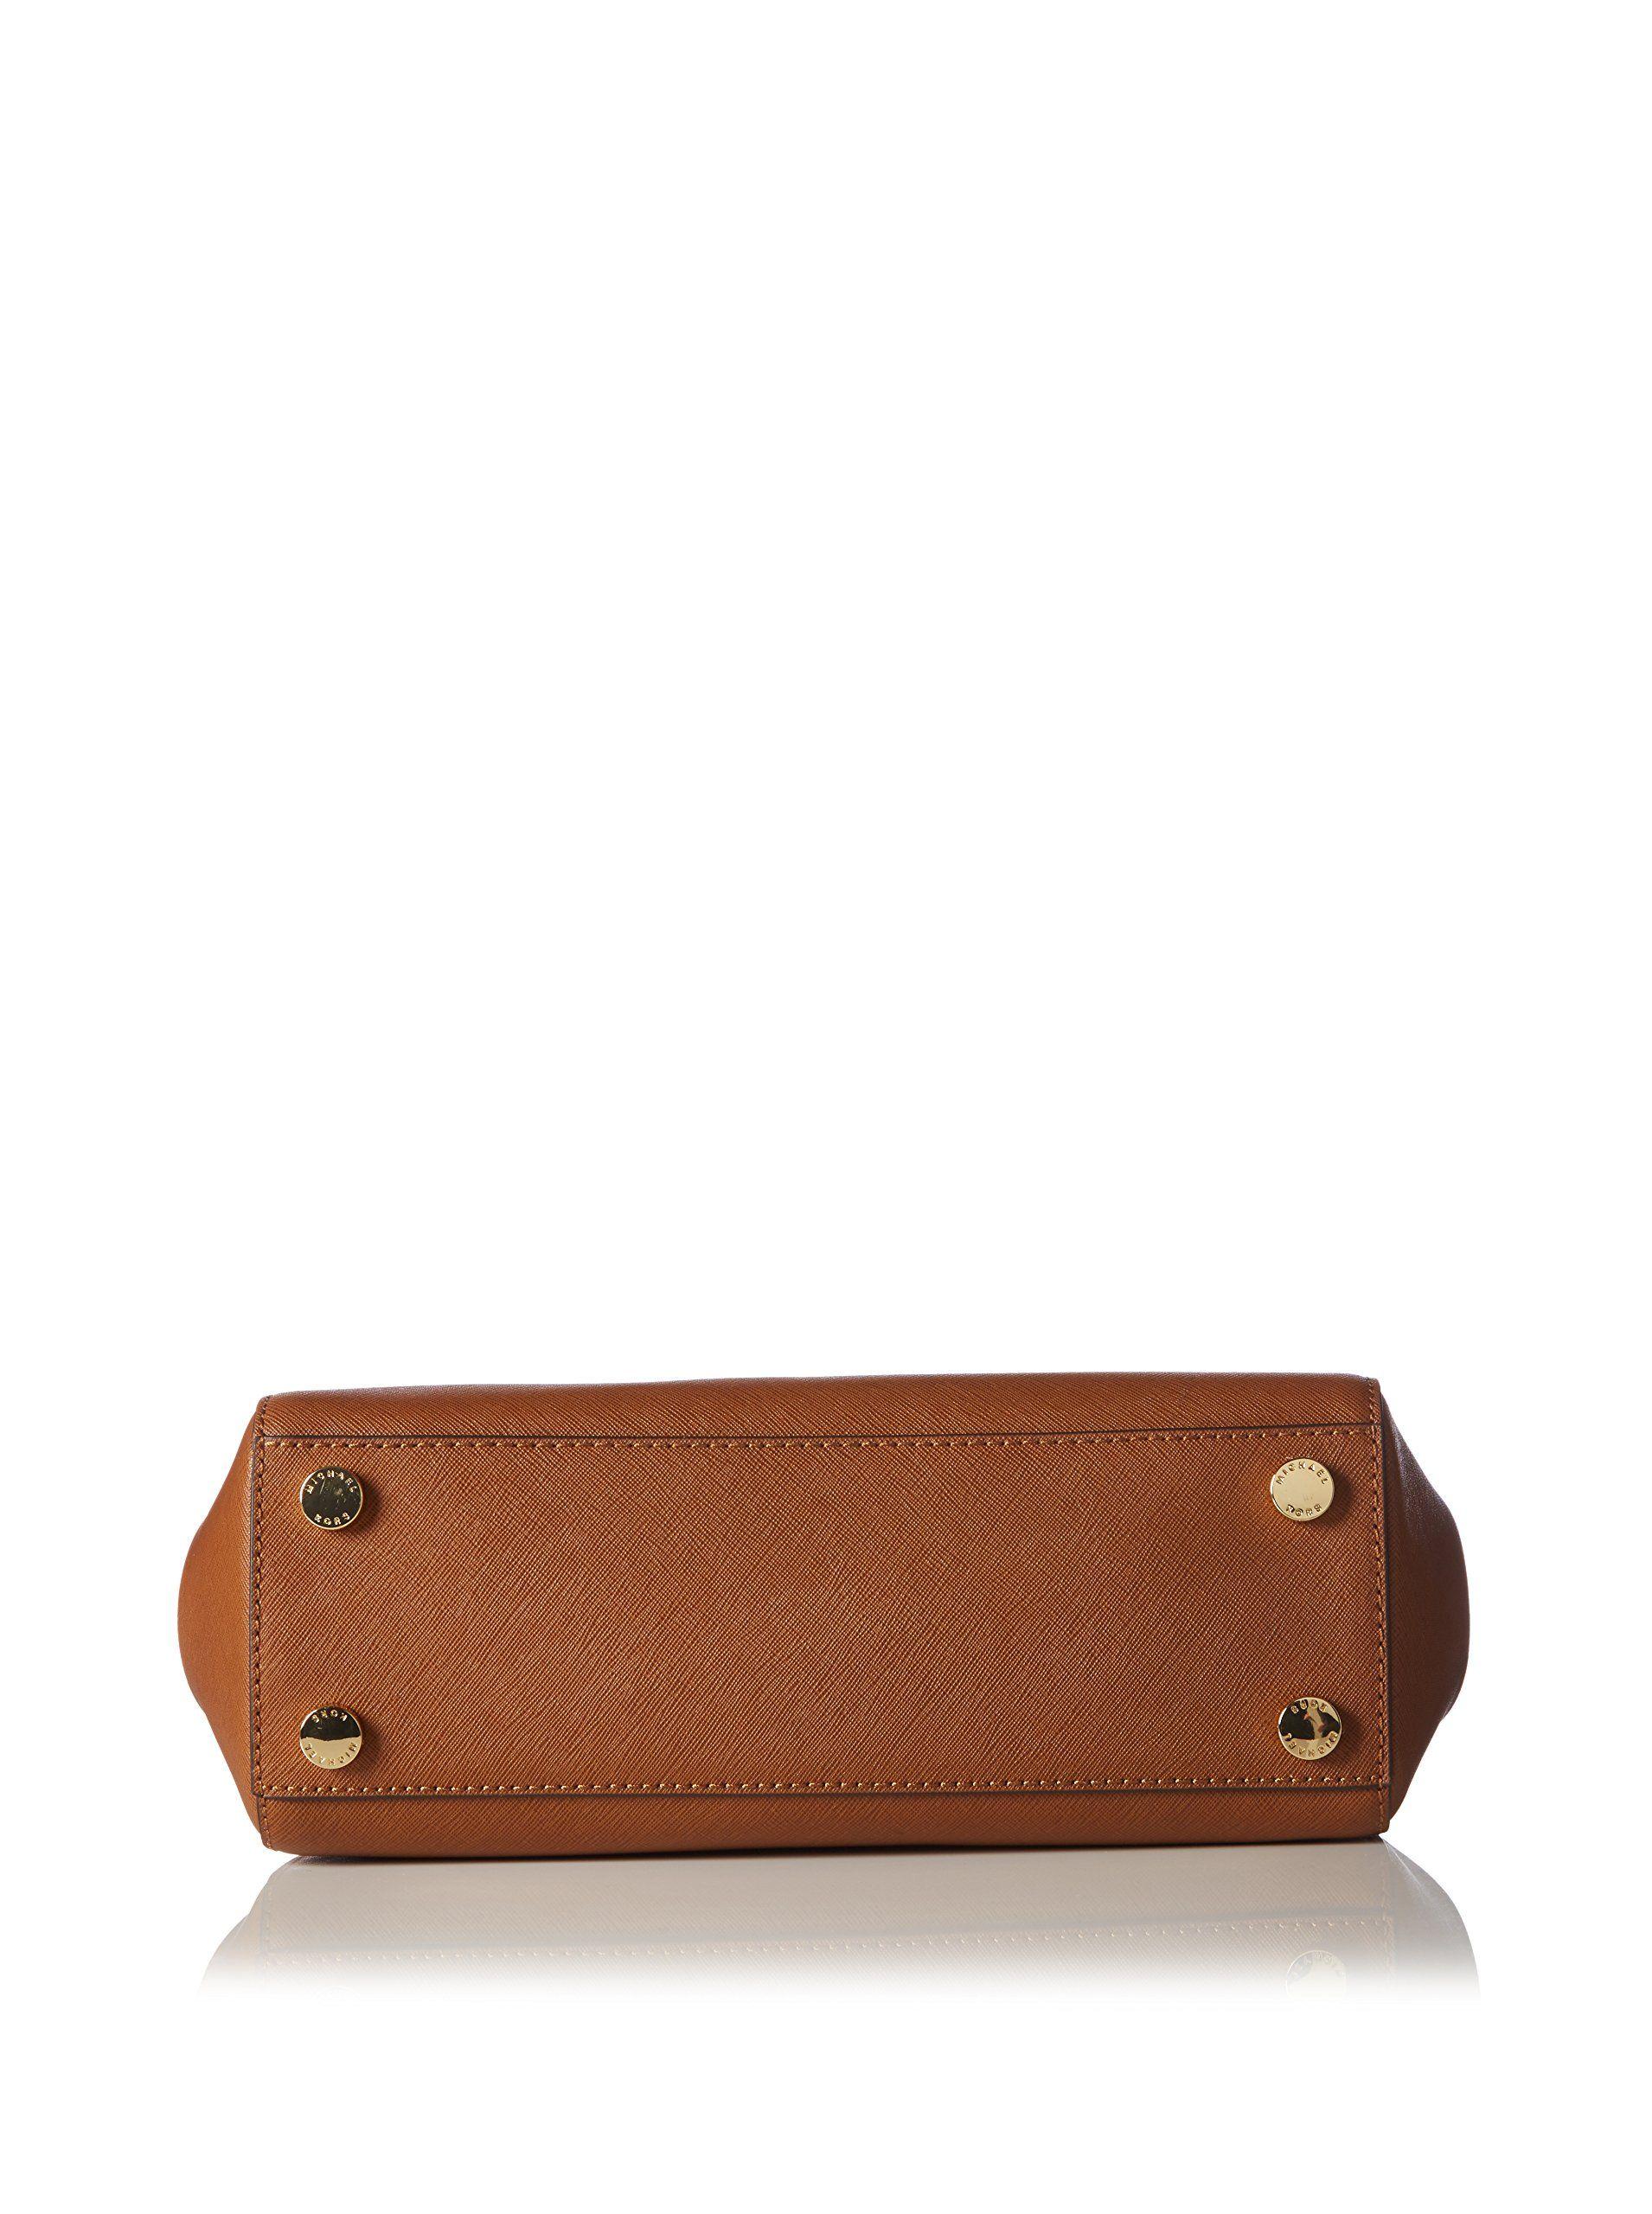 e85006cf679c Amazon.com: Michael Kors Sutton Small Saffiano Leather Satchel in Luggage:  Shoes